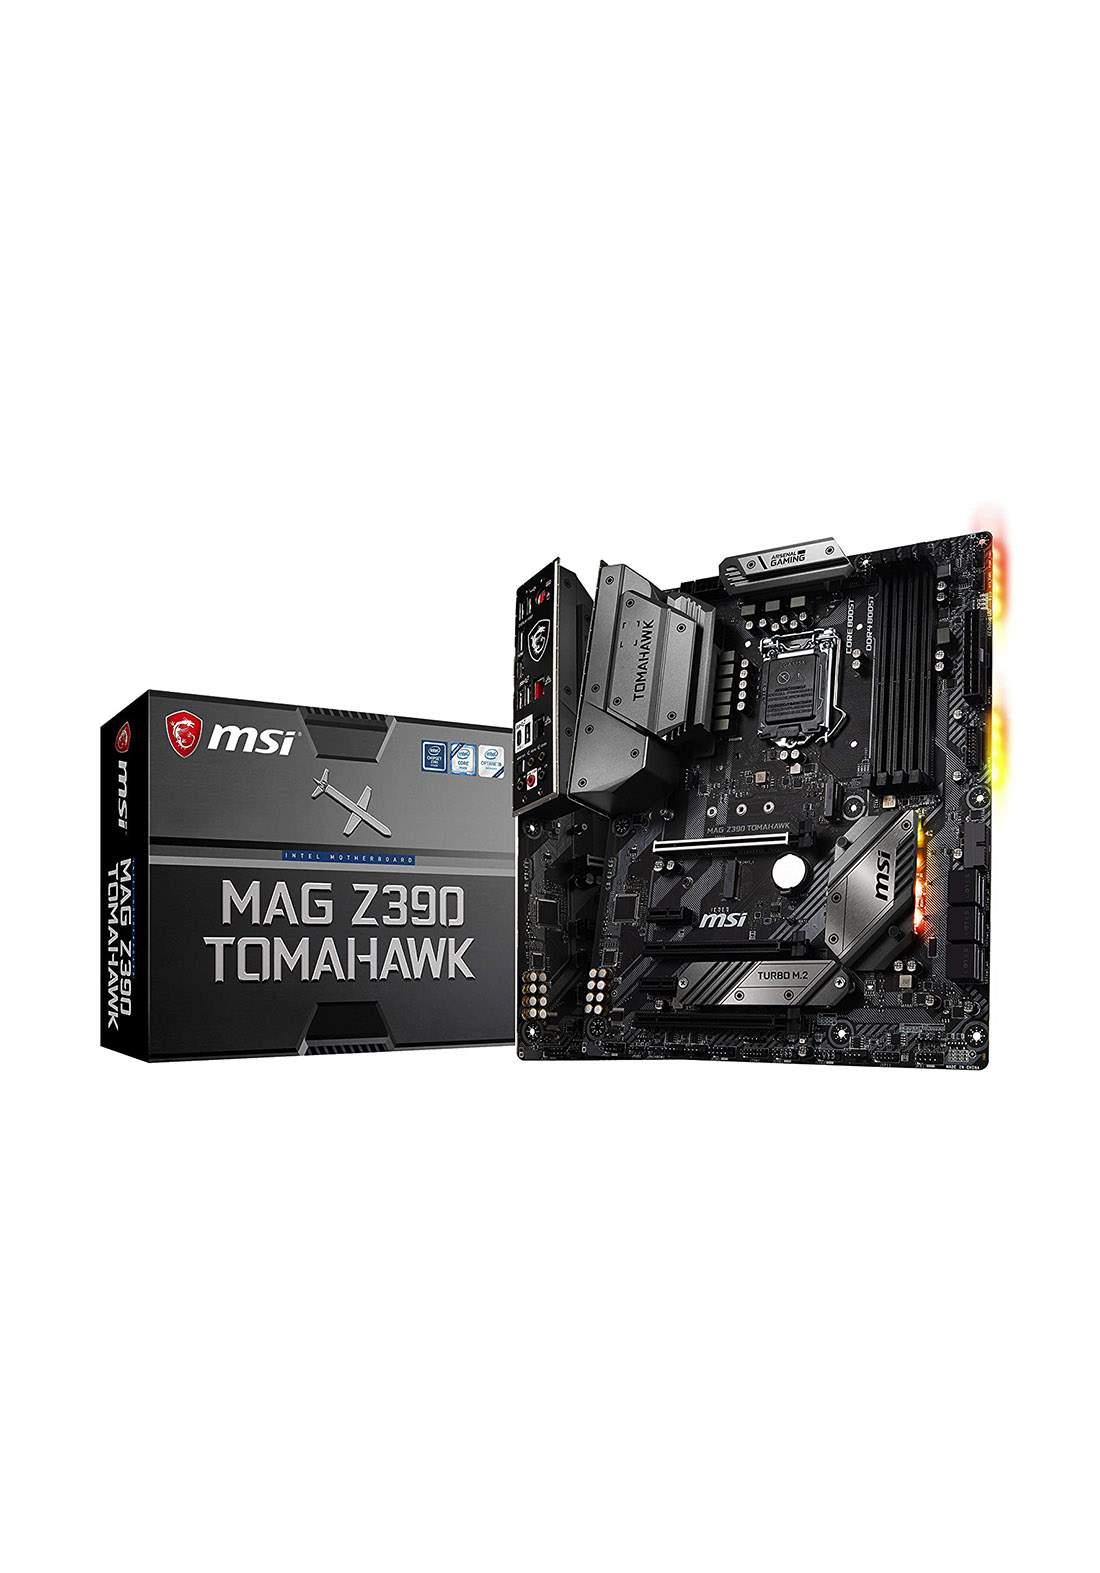 Msi Z390 Mag Tomahawk Atx Lga1151 Motherboard لوحة الام